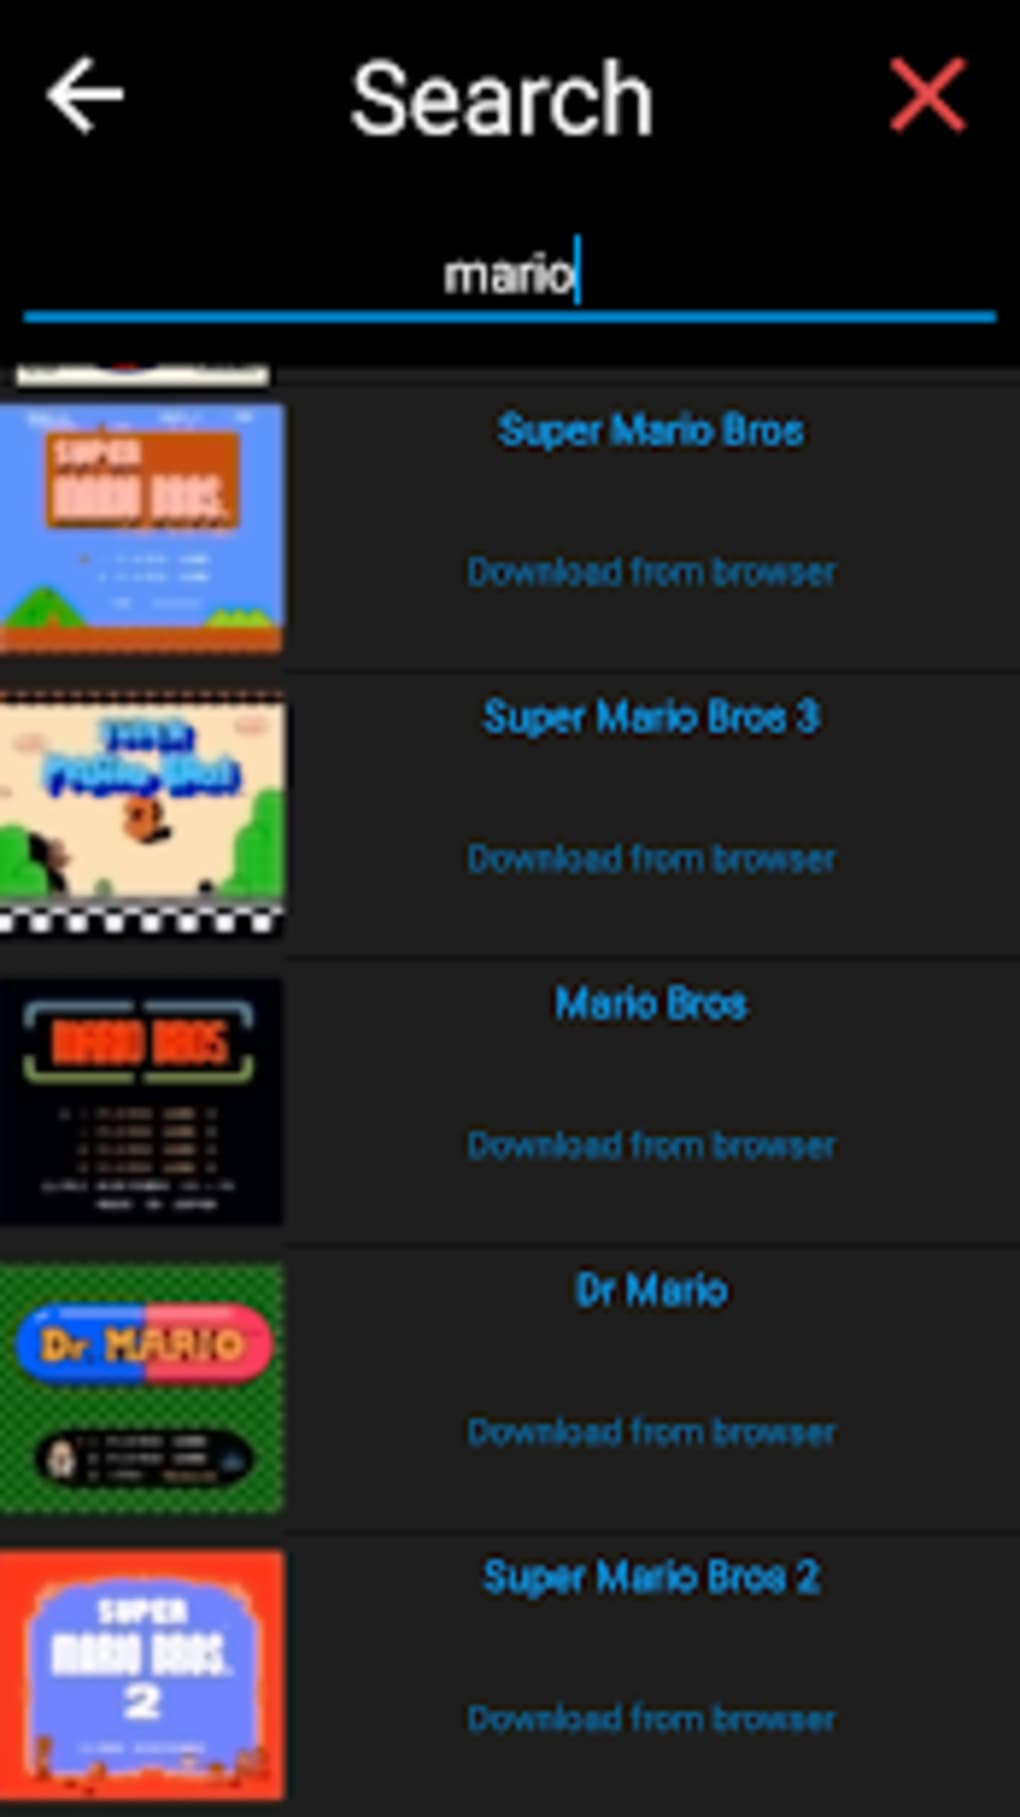 super mario bros 3 nes emulator download